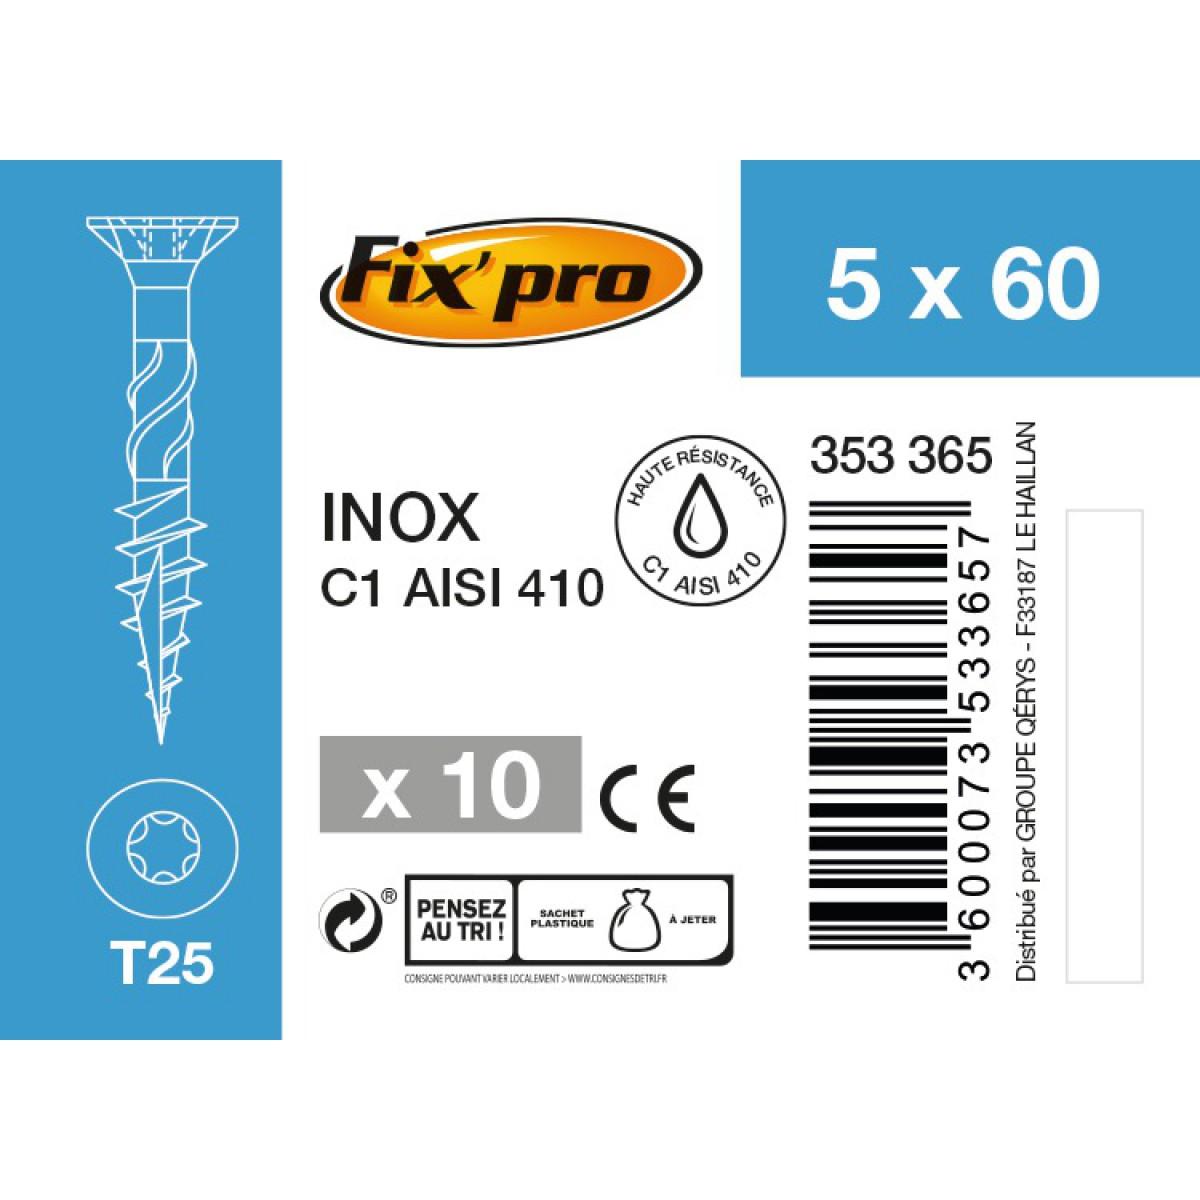 Vis terrasse inox C1 - 5x60 - 10pces - Fixpro